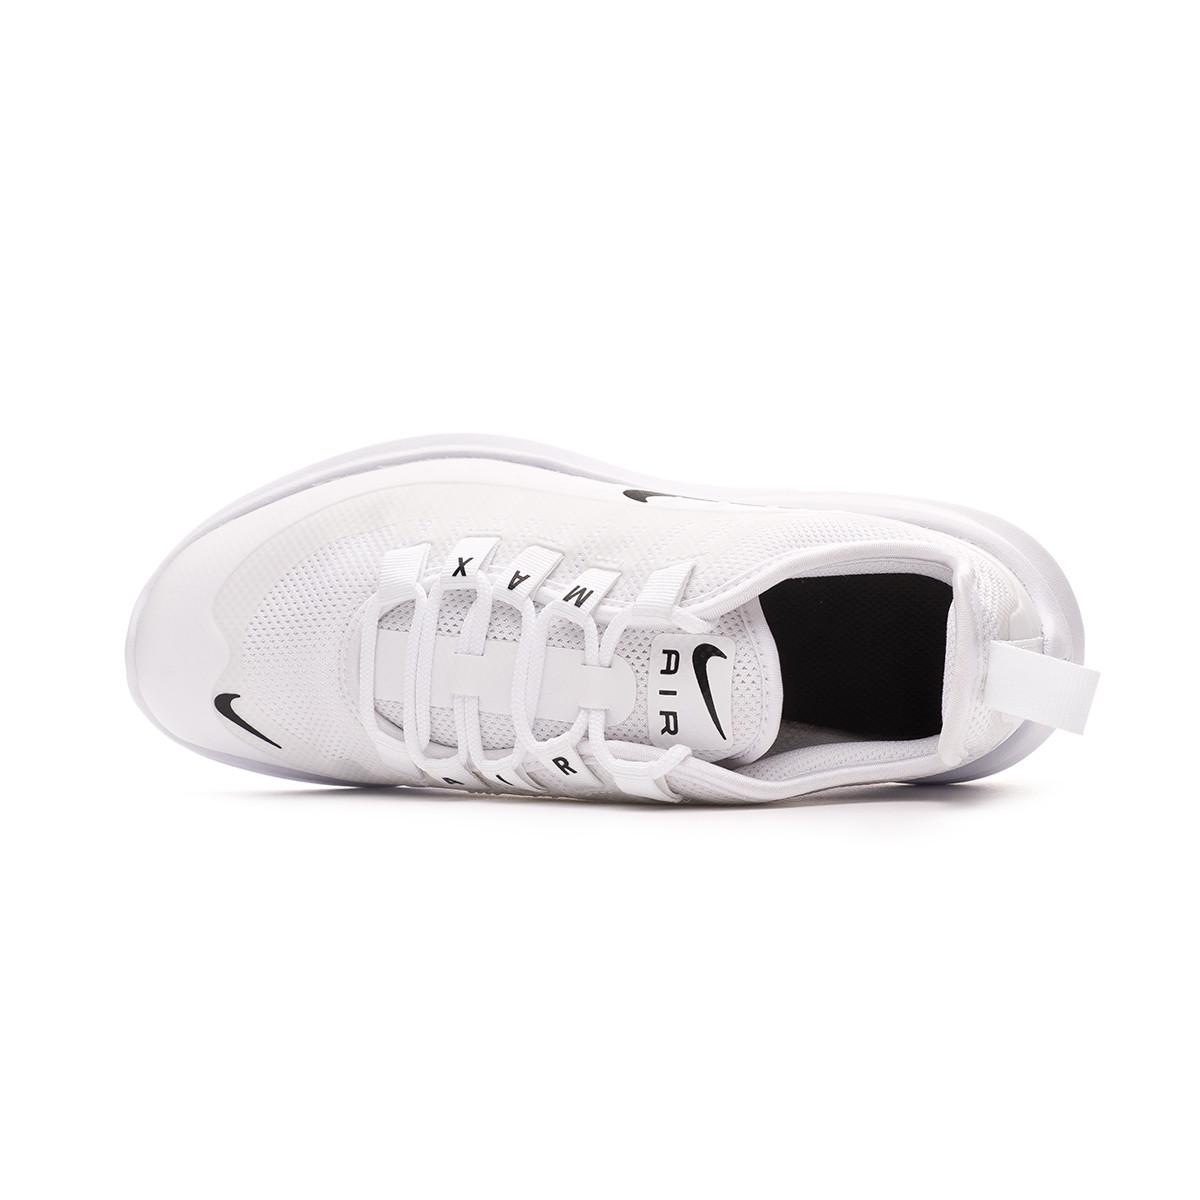 premium selection c2495 9023f Trainers Nike Kids Air Max Axis White-Black - Football store Fútbol Emotion